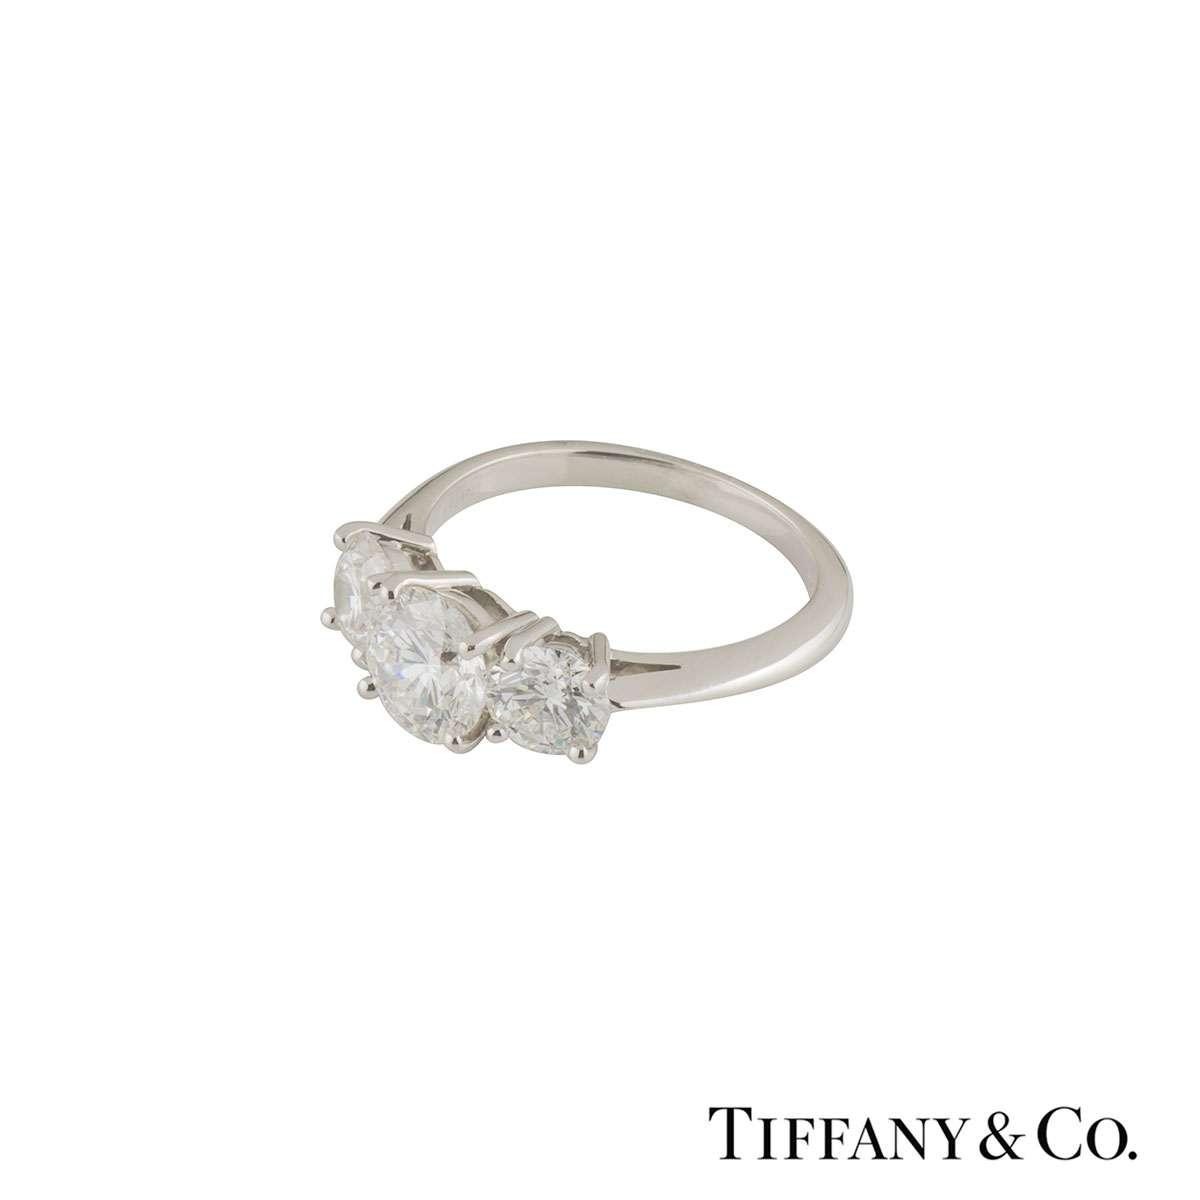 tiffany co diamond trilogy ring rich diamonds of bond street. Black Bedroom Furniture Sets. Home Design Ideas